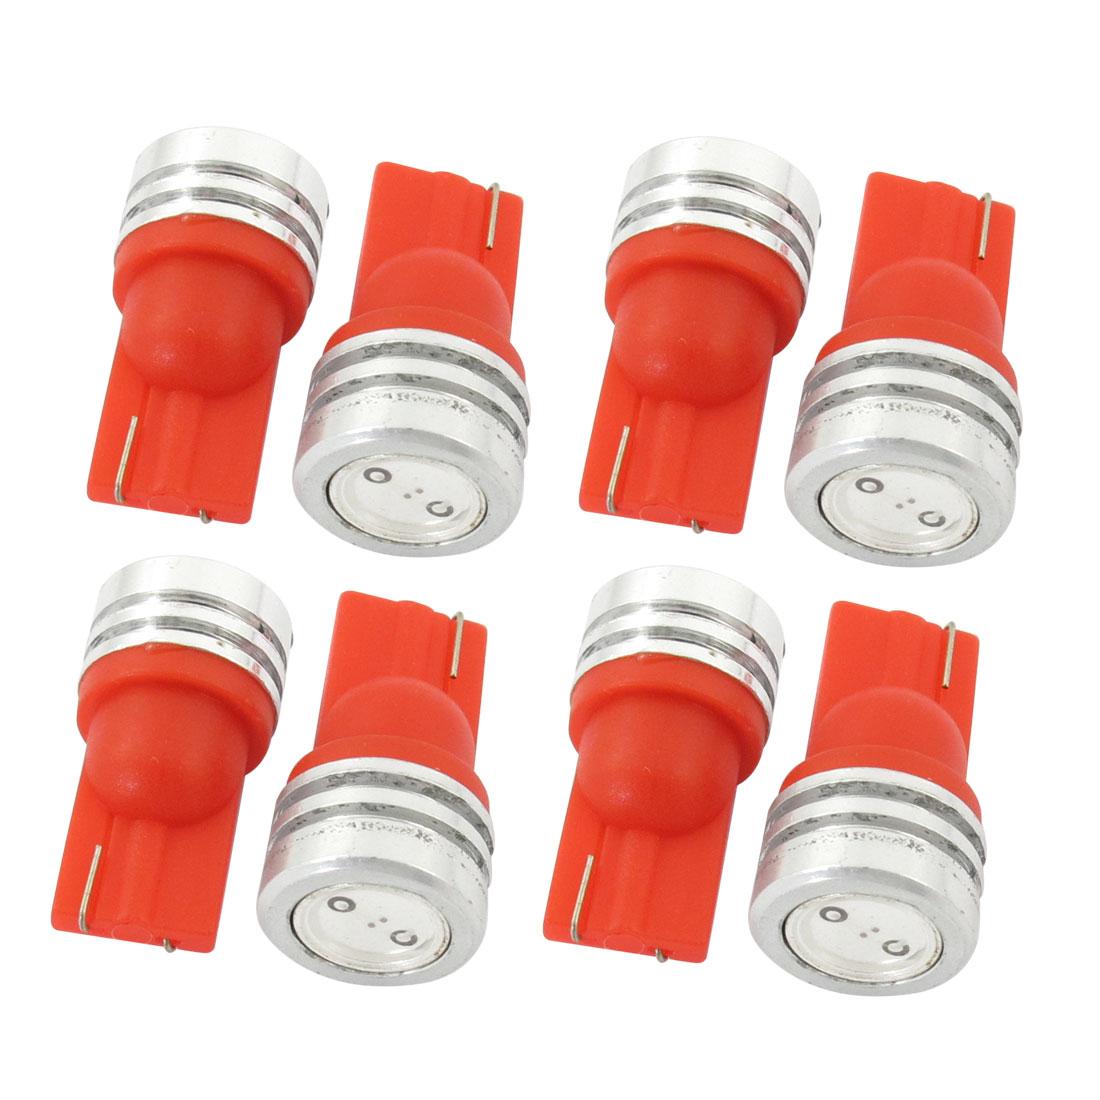 T10 2821 12V 1W Red LED Bulb Car Auto Dashboard Light Lamp 8 Pcs